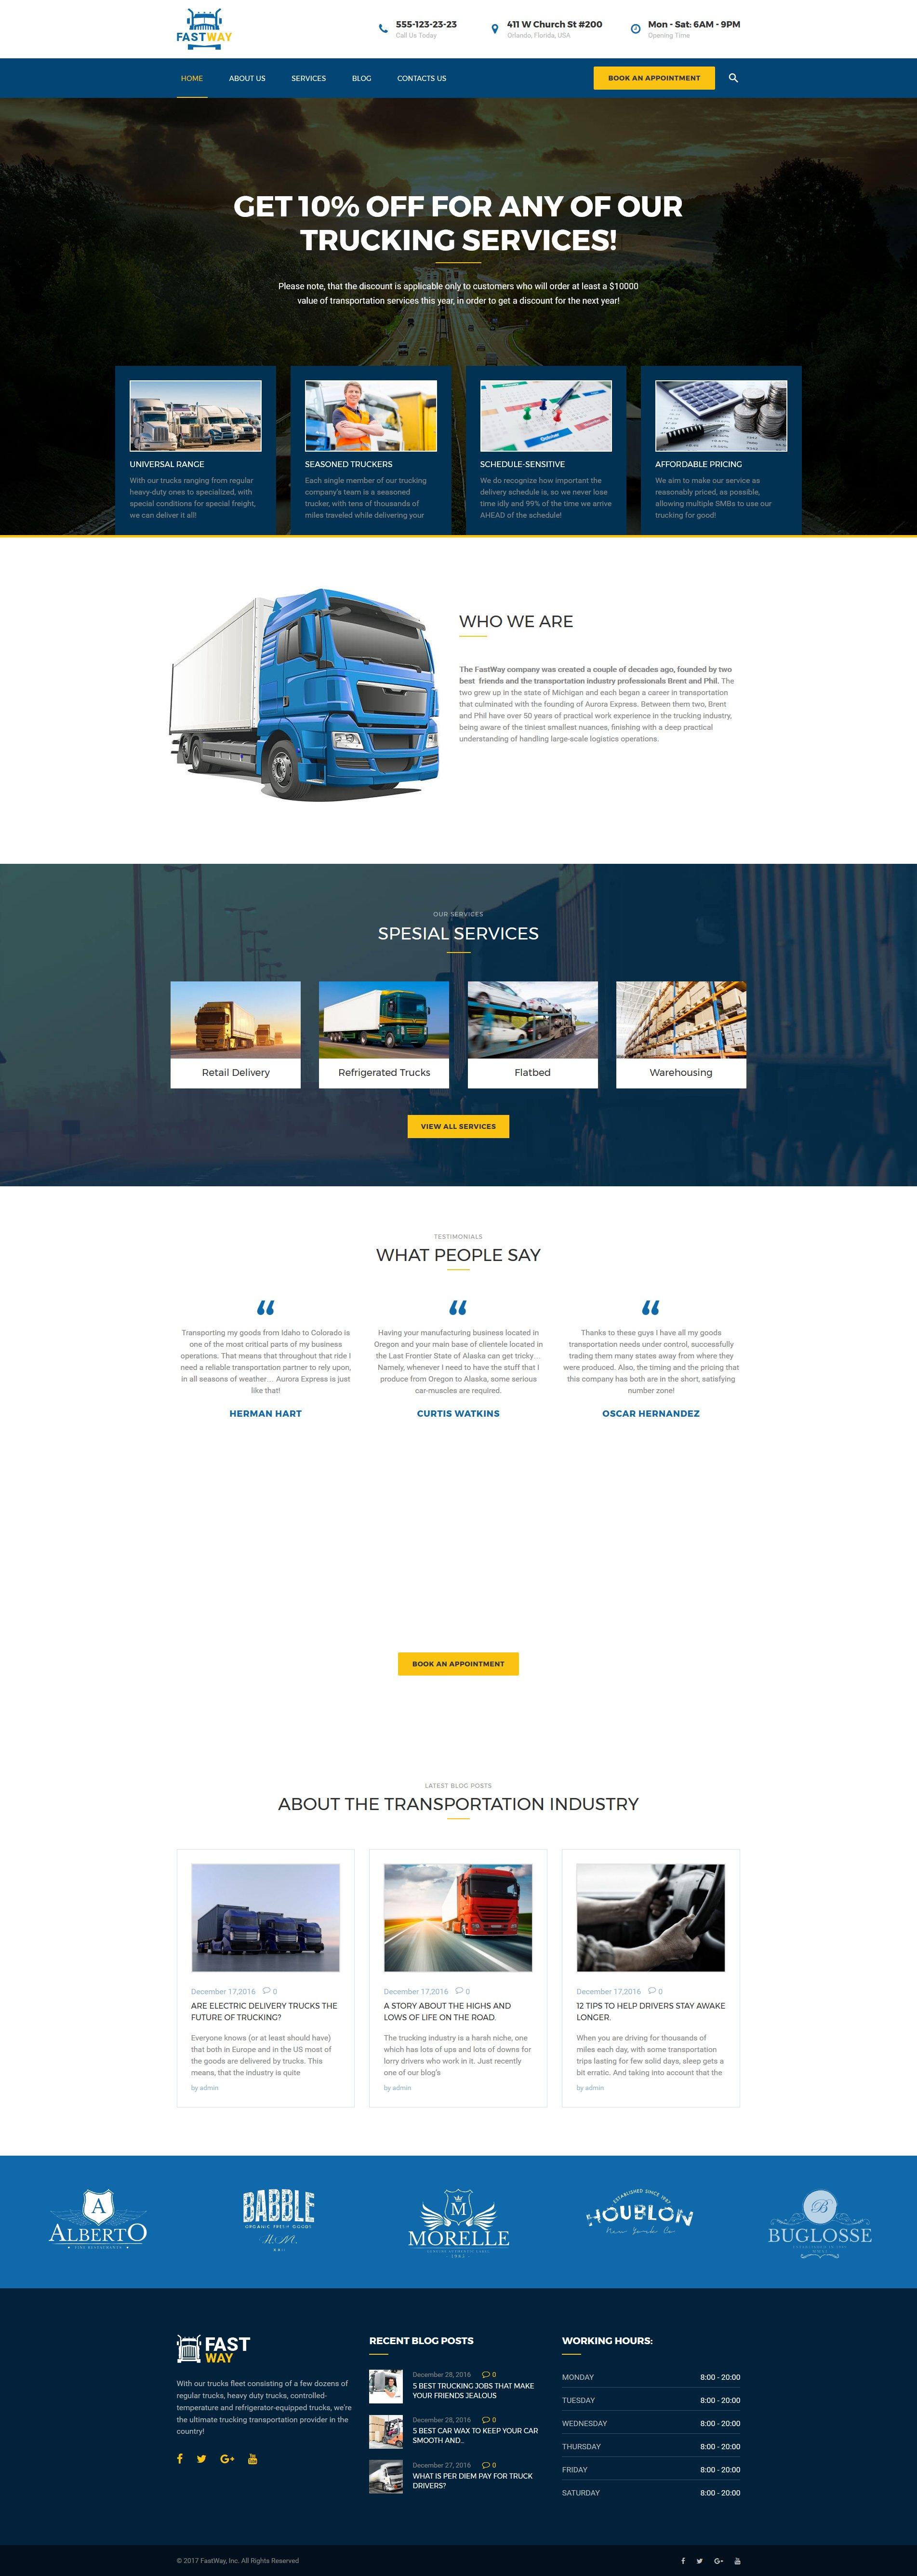 FastWay - Transportation Company Responsive WordPress Theme - screenshot